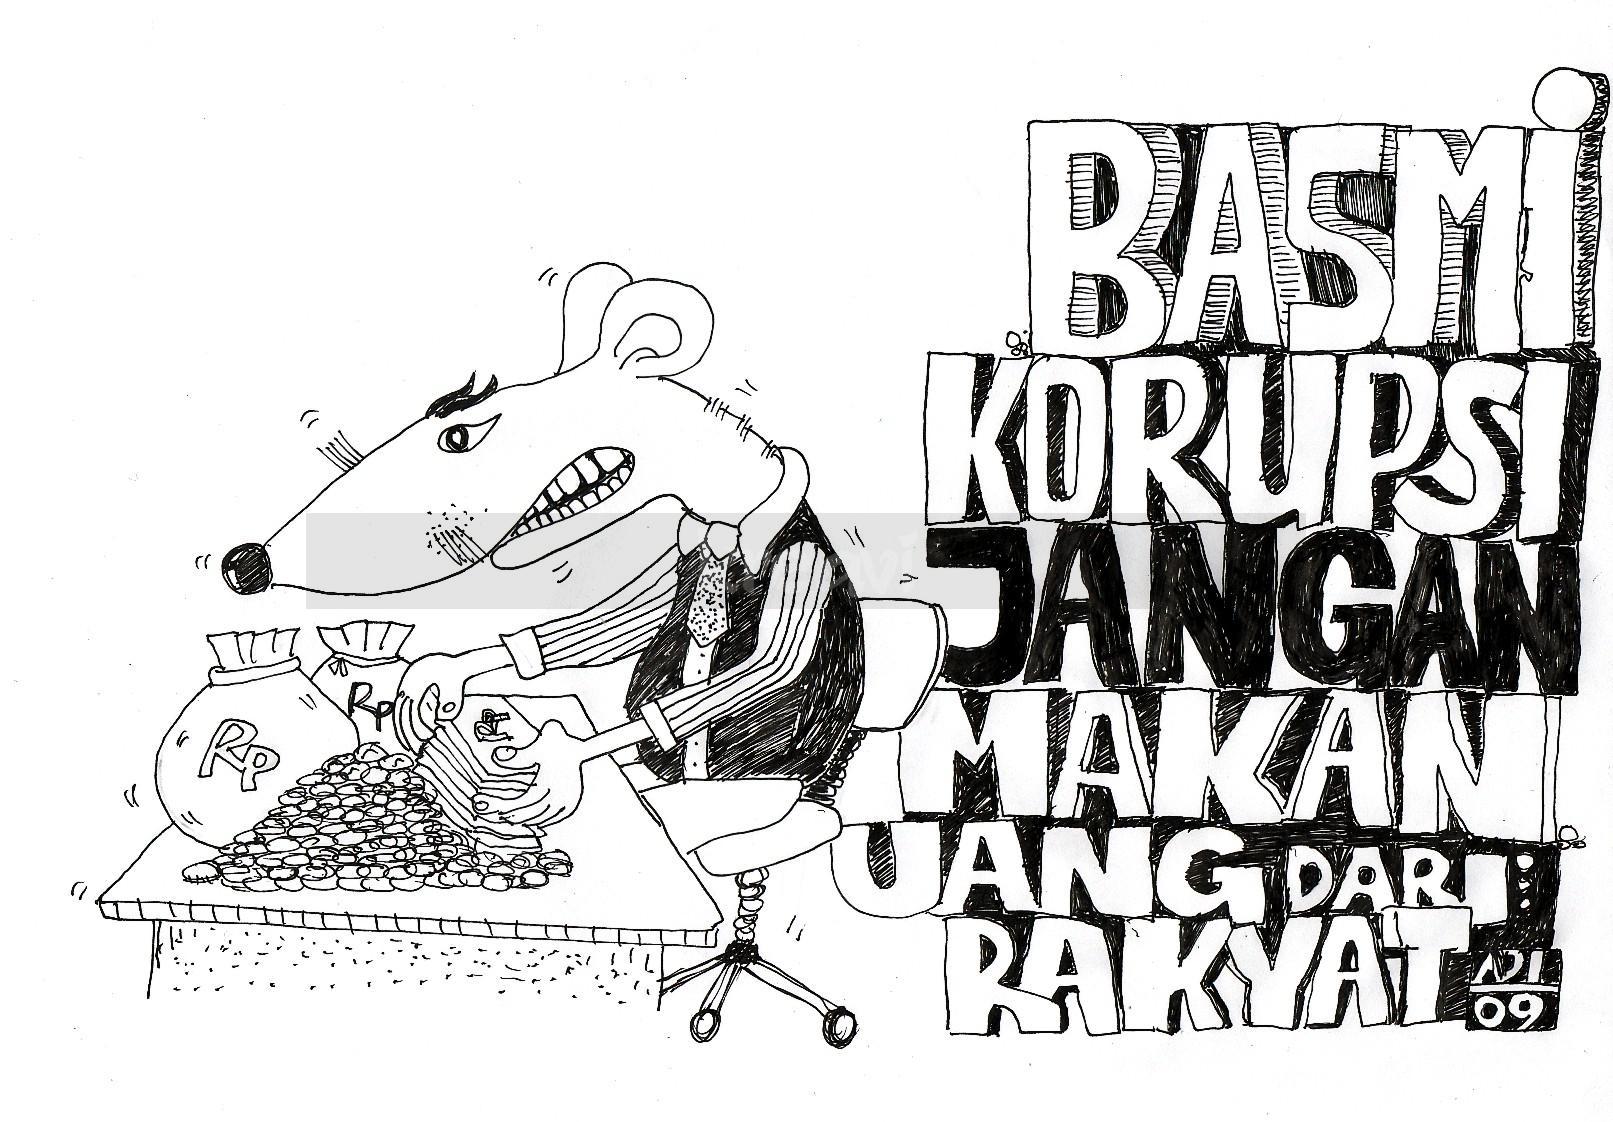 30 Ide Keren Gambar Sketsa Poster Tentang Anti Korupsi